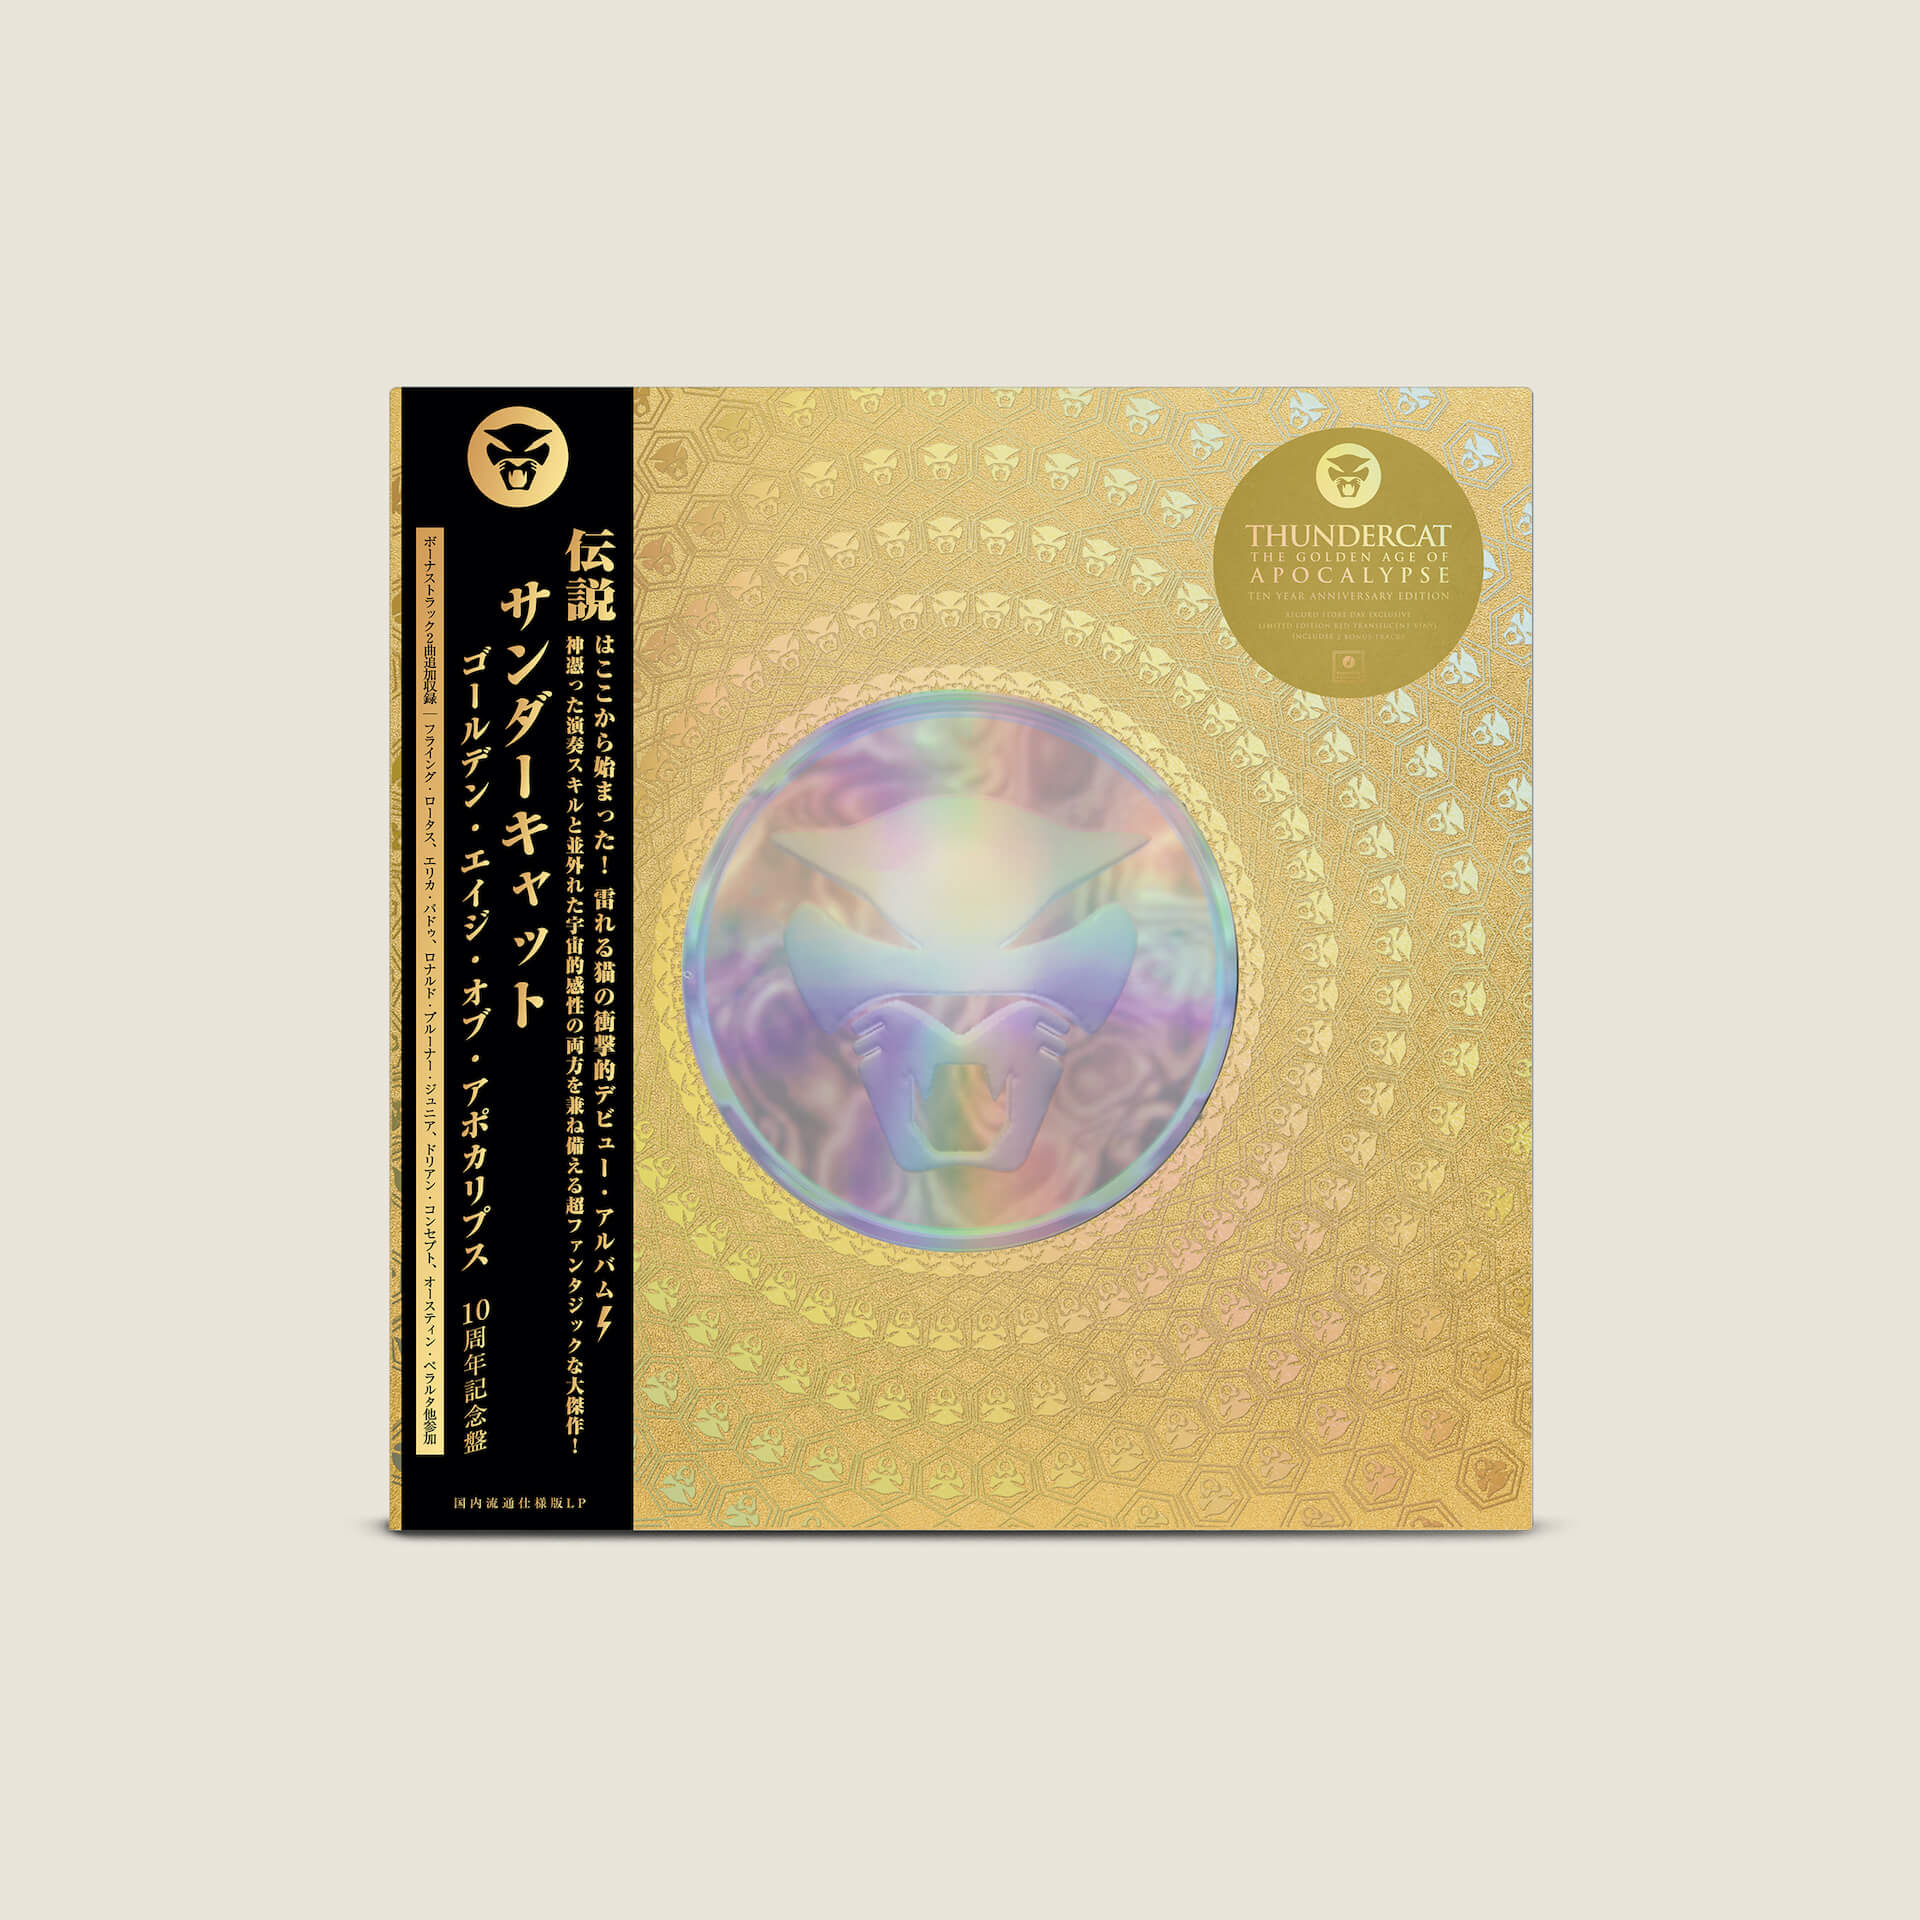 Thundercat『Golden Age of Apocalypse』10周年記念盤がリリース決定!Flying Lotusプロデュースの傑作 music210916_thunder_cat-04